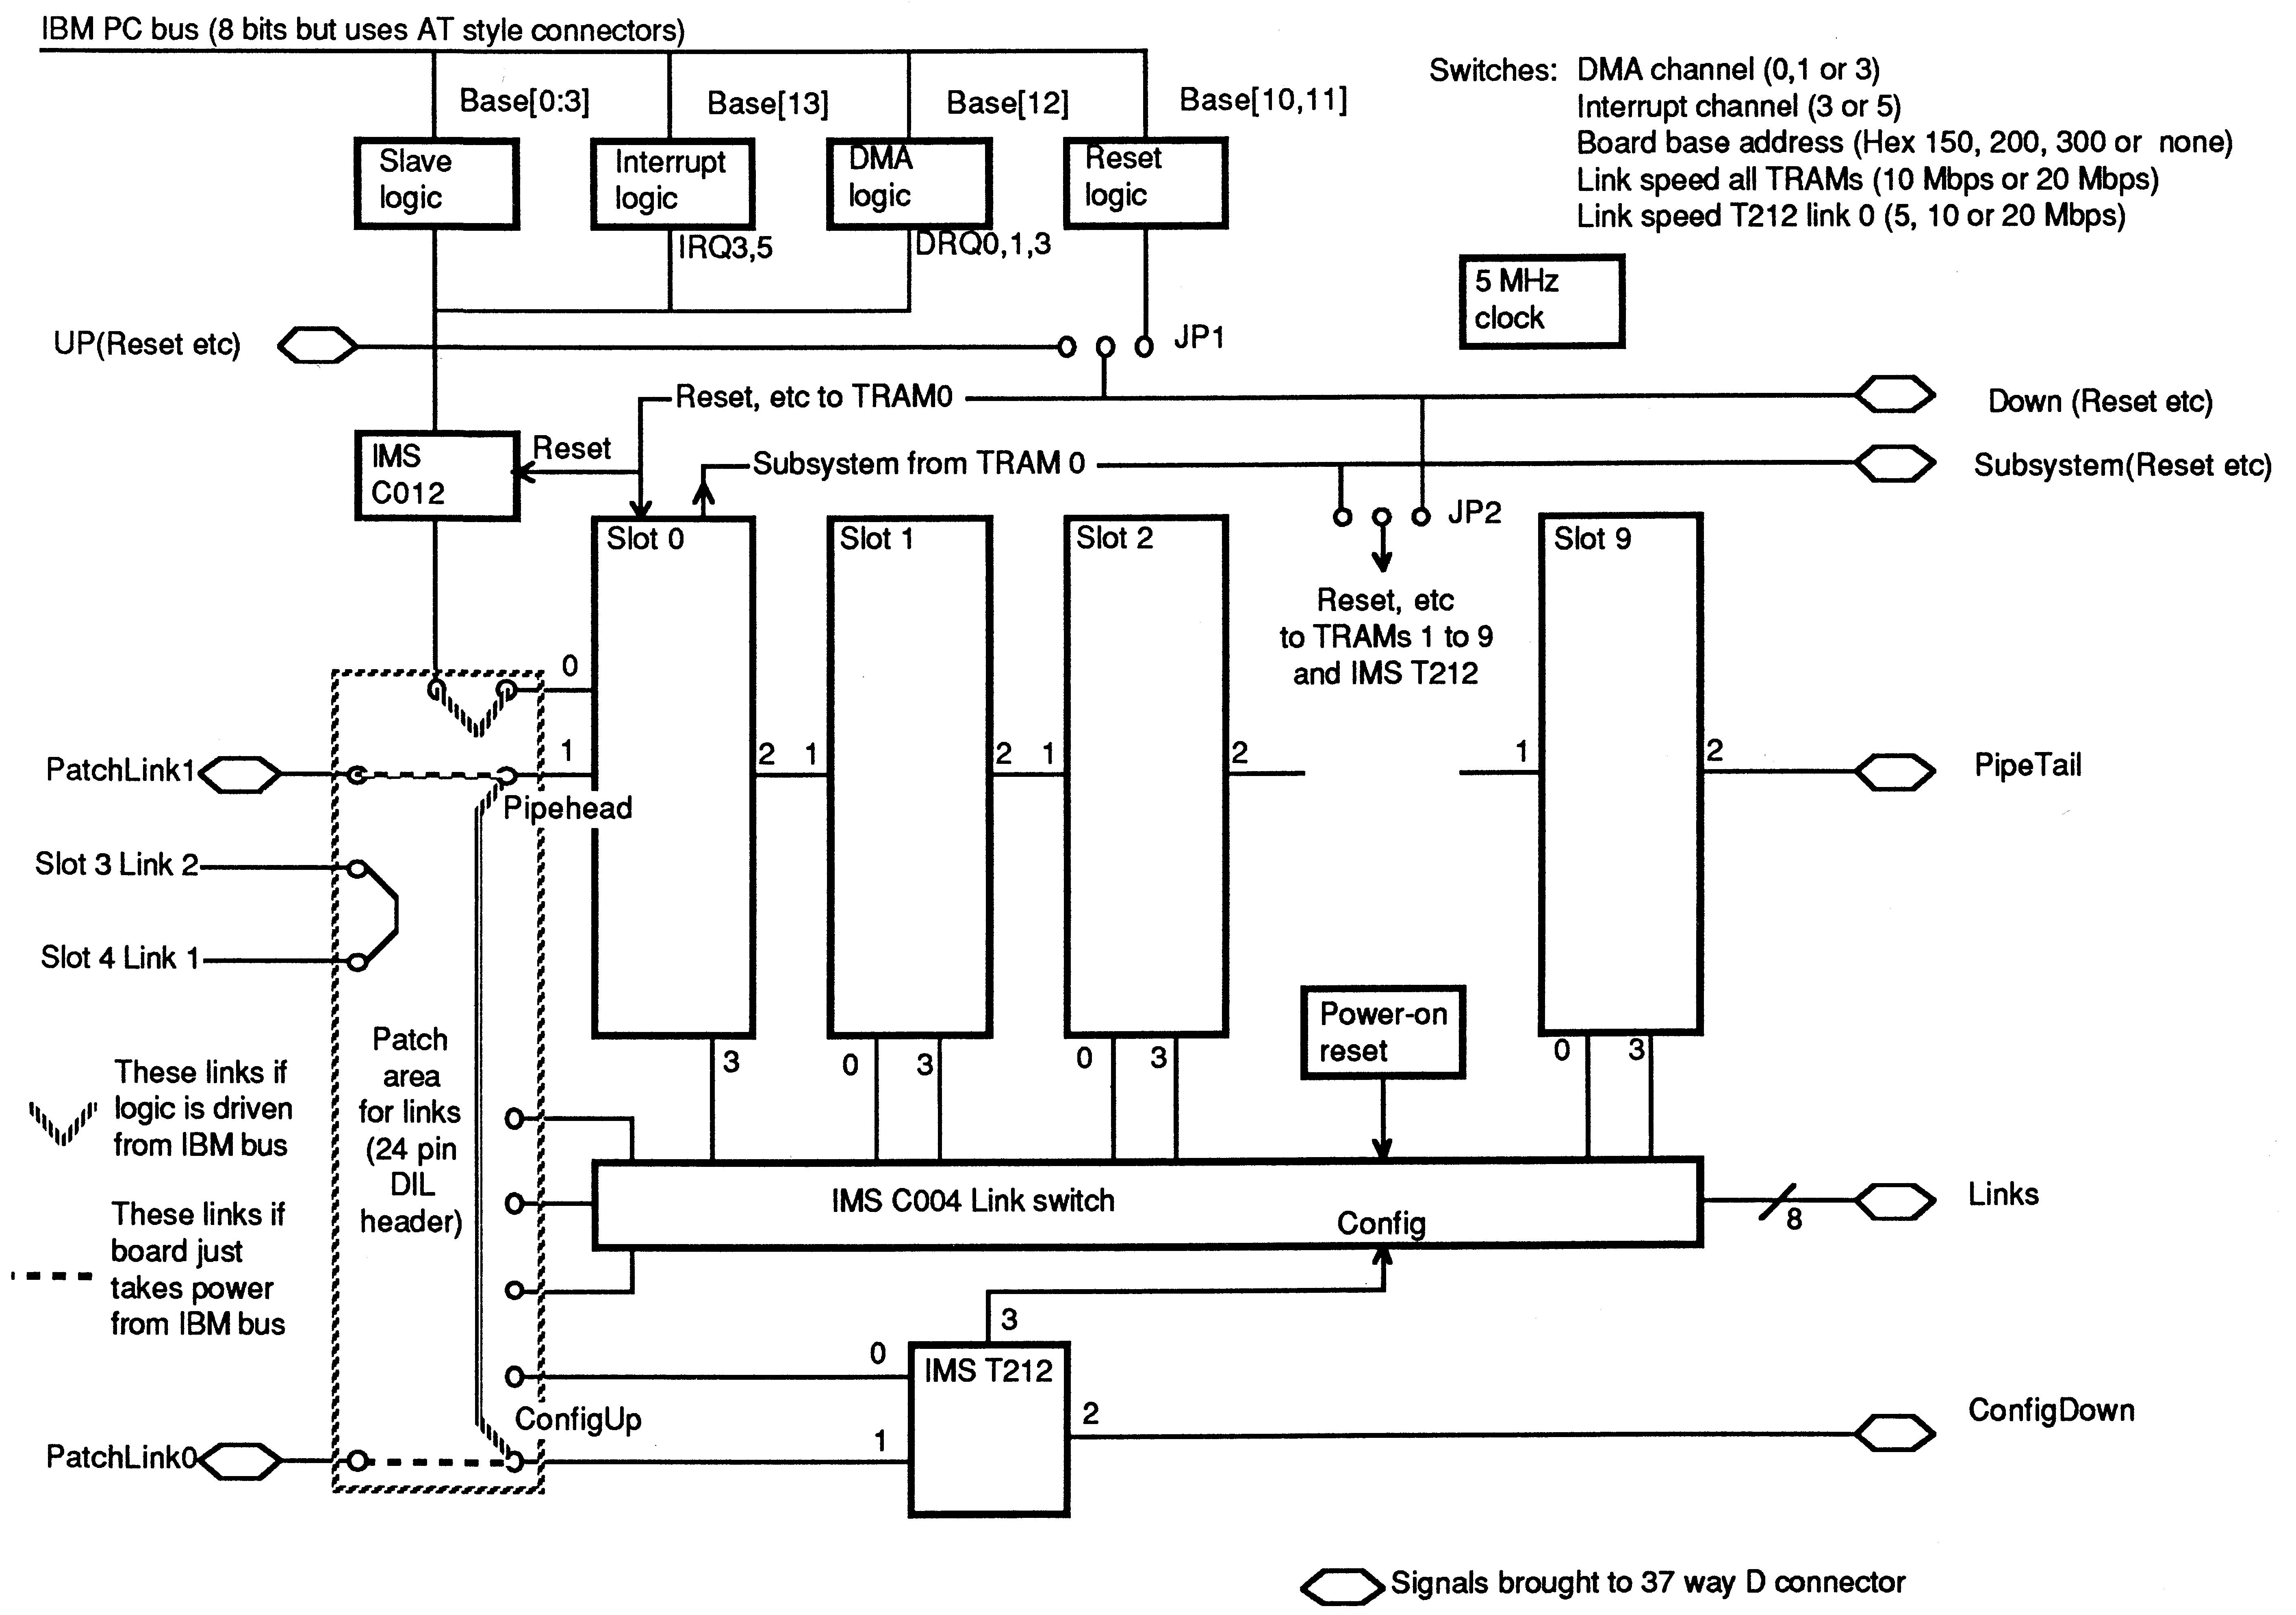 Give block diagram of dma controller explain dma transfer user manual ims b008 user guide and reference manual block diagram pooptronica